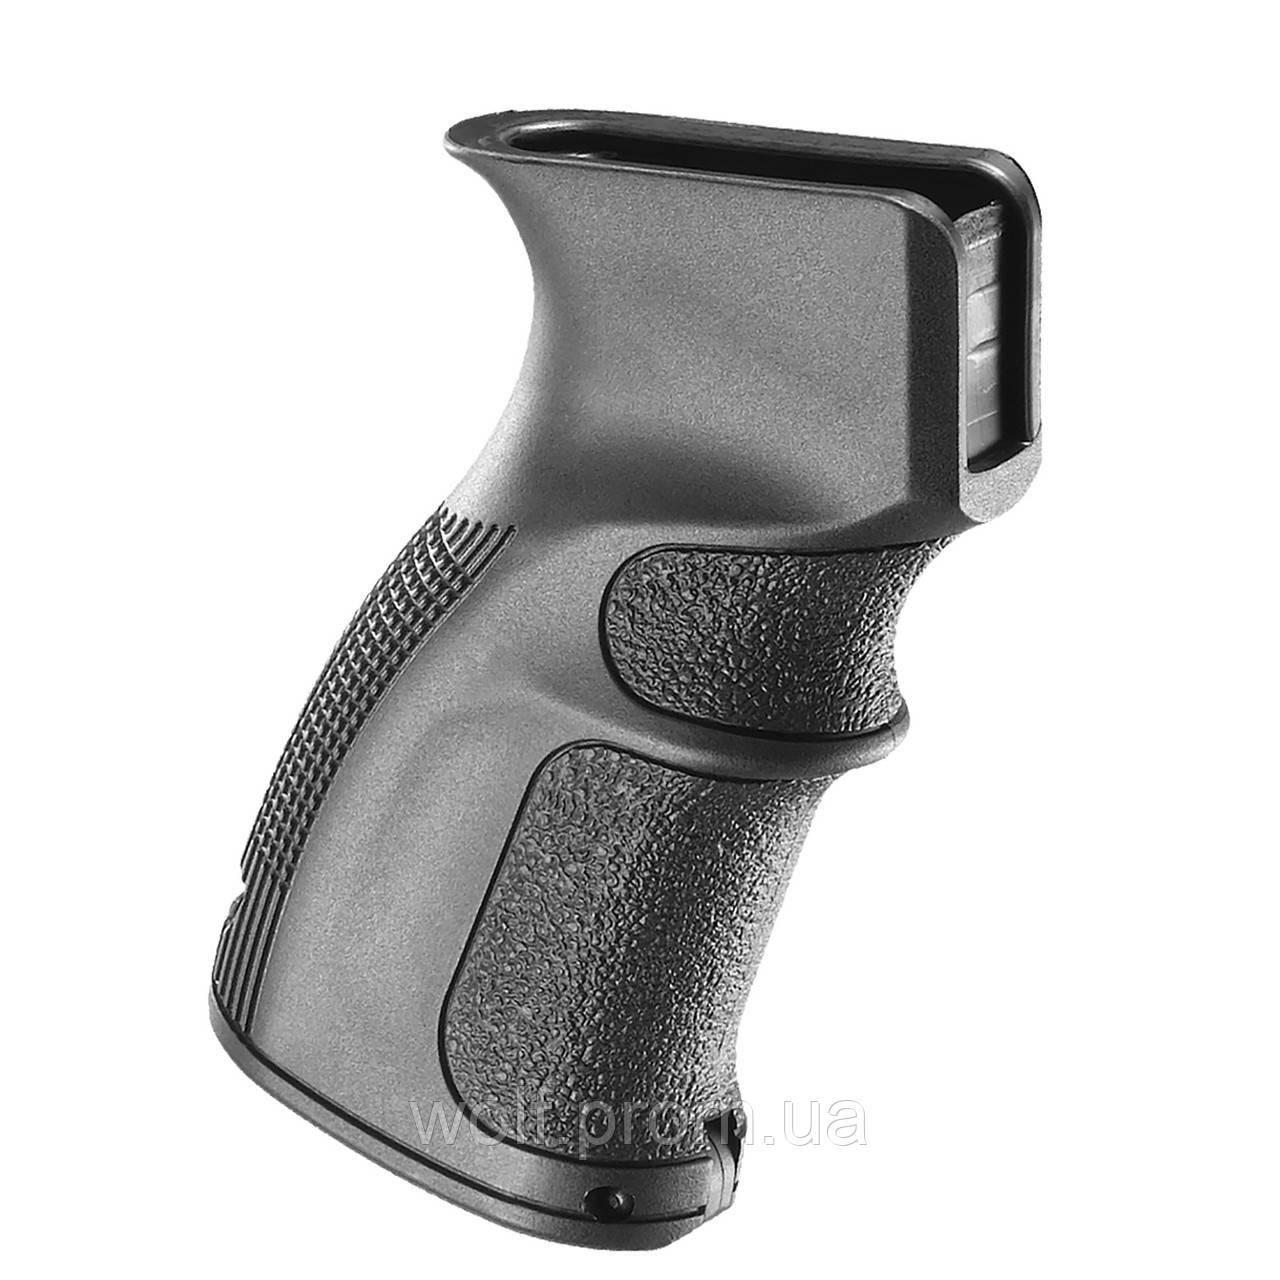 Рукоятка пистолетная AG 47 Fab Defenseна на автоматы Калашникова